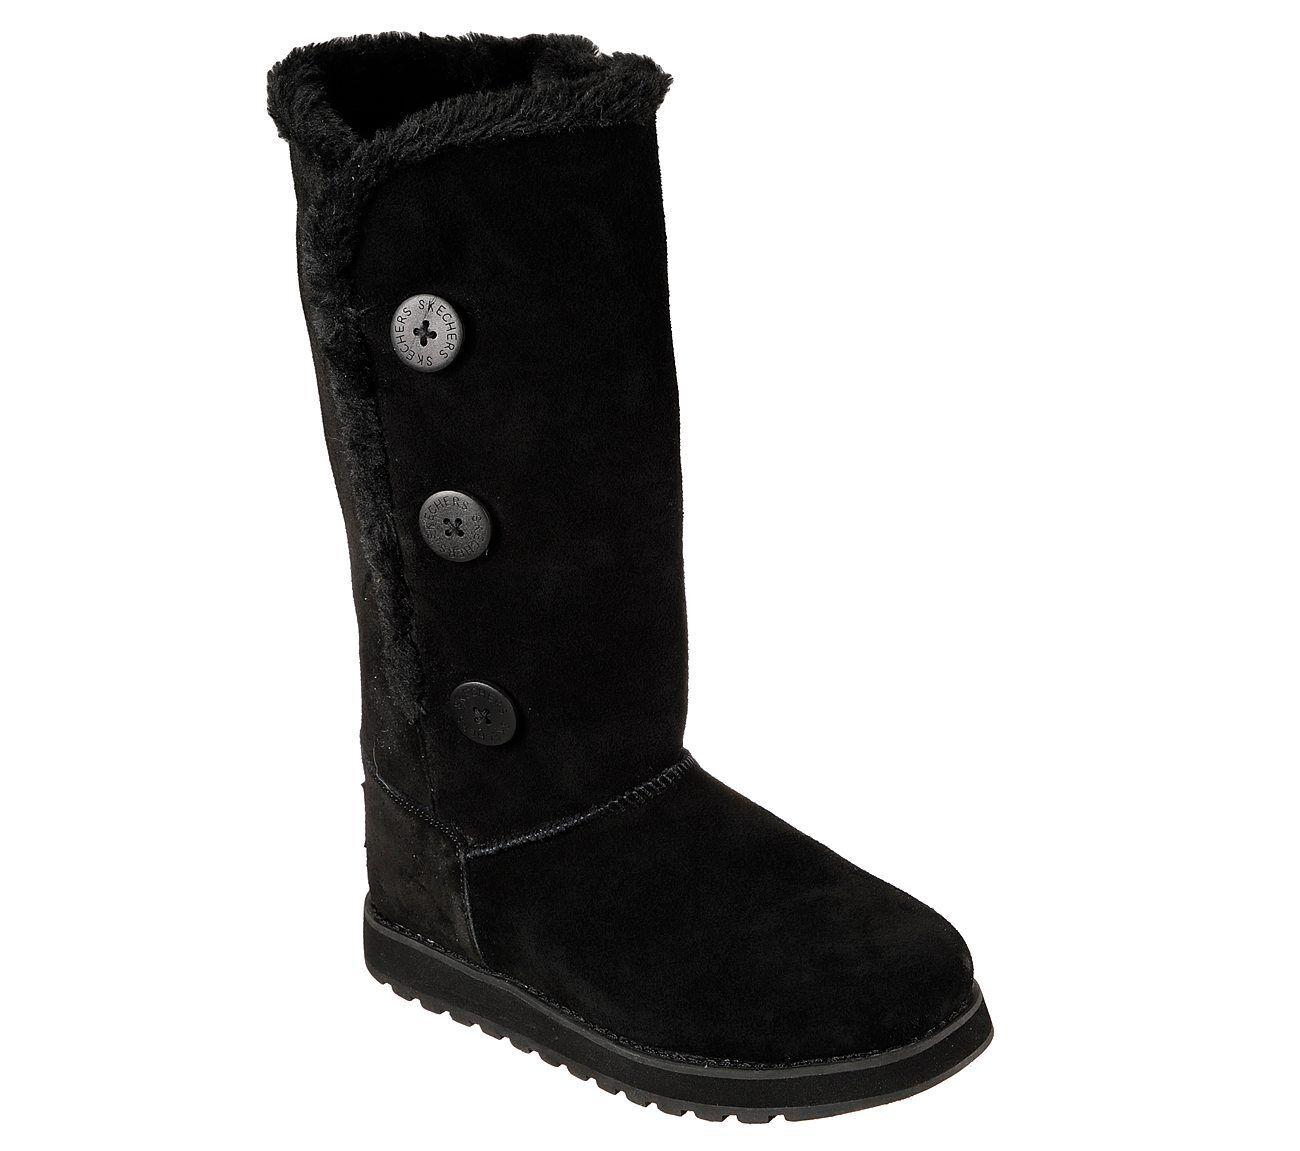 f86e436c6ae1f Skechers Keepsakes Winter Solstice Boots Womens Memory Foam Tall Mid Calf  Suede